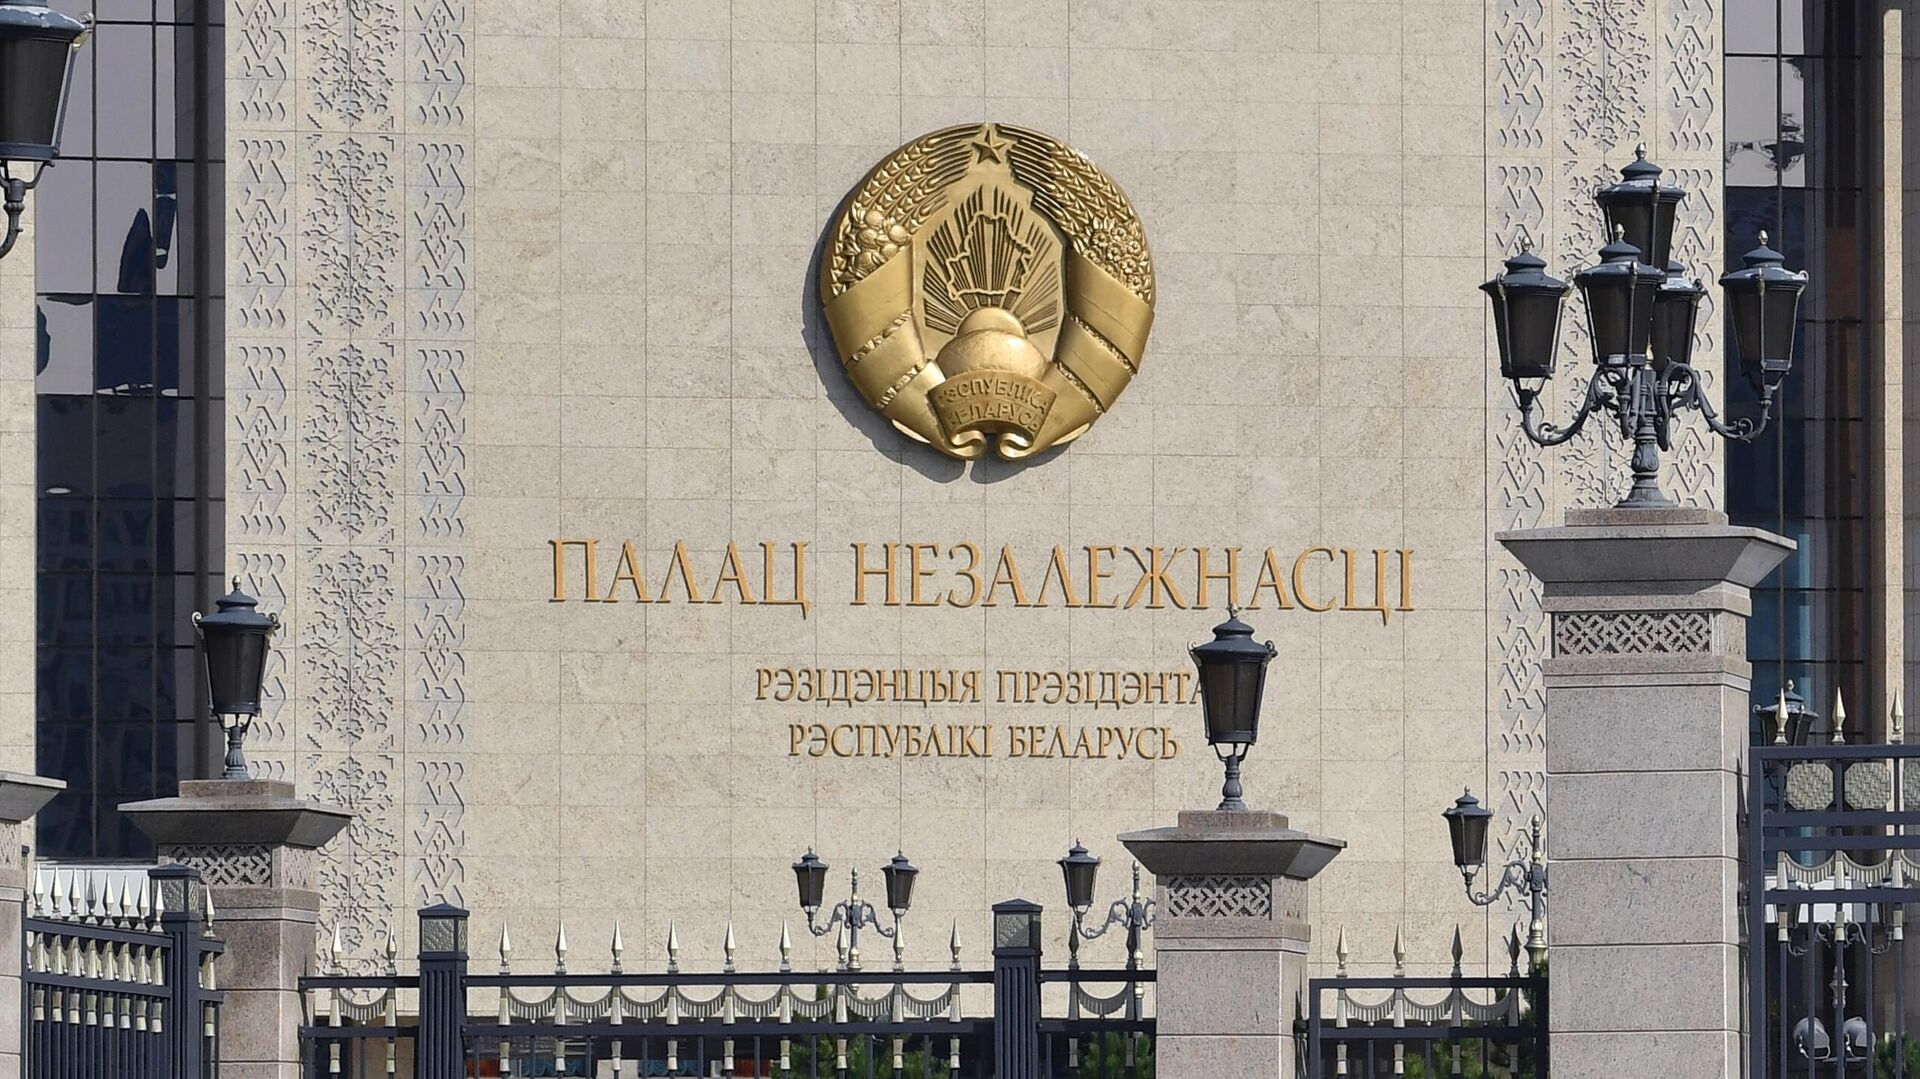 Дворец Независимости в Минске - РИА Новости, 1920, 23.09.2020